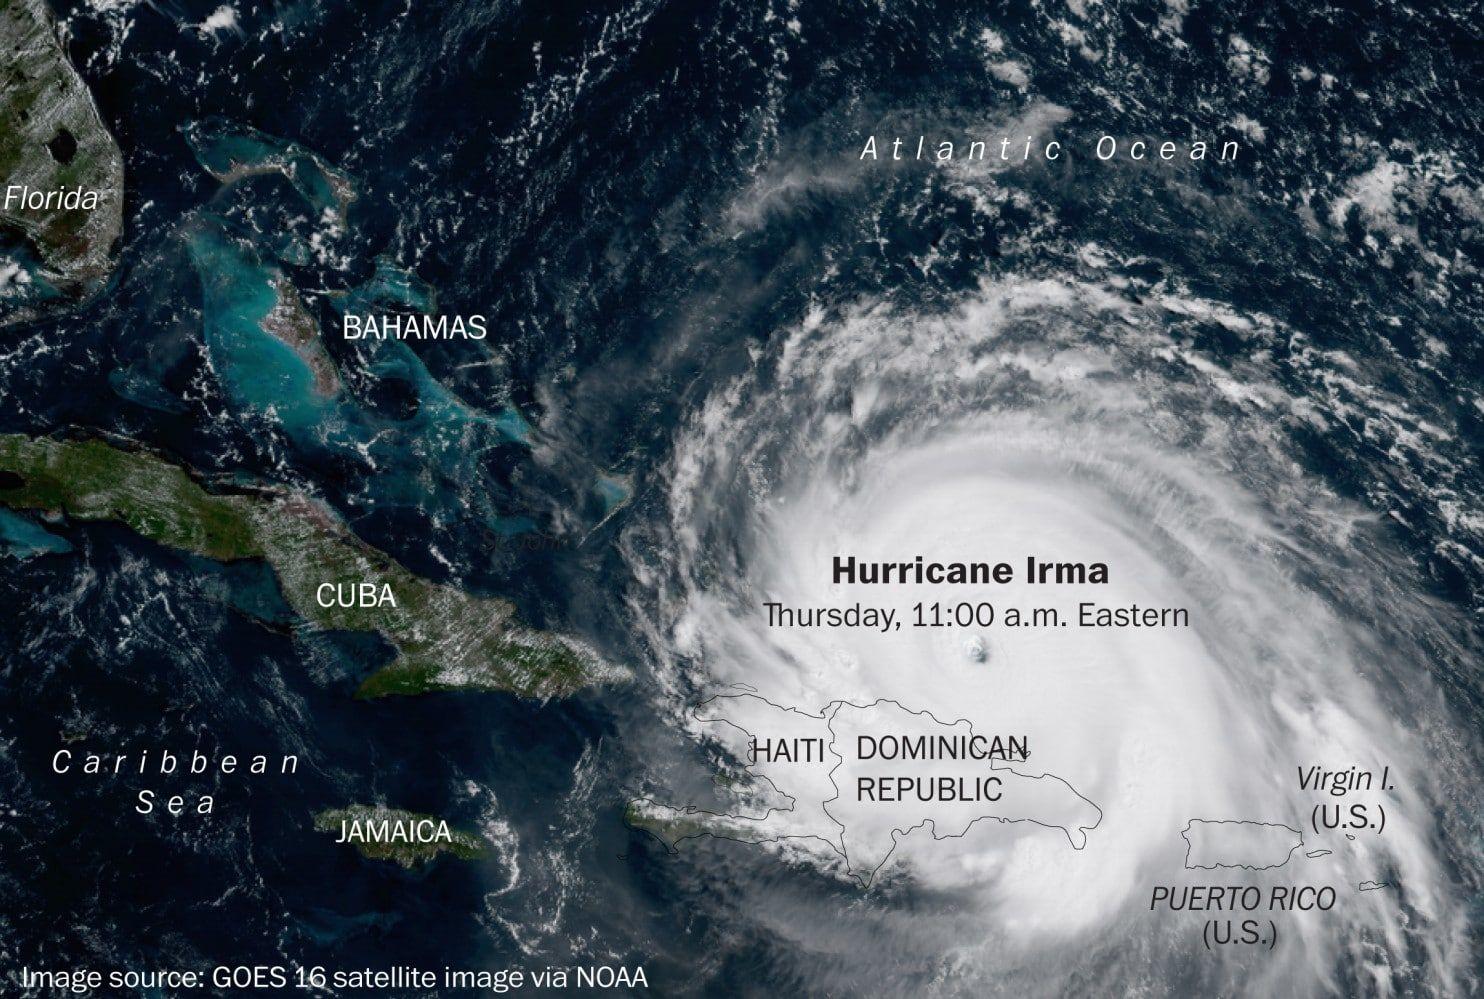 Florida governor has ignored climate change risks, critics